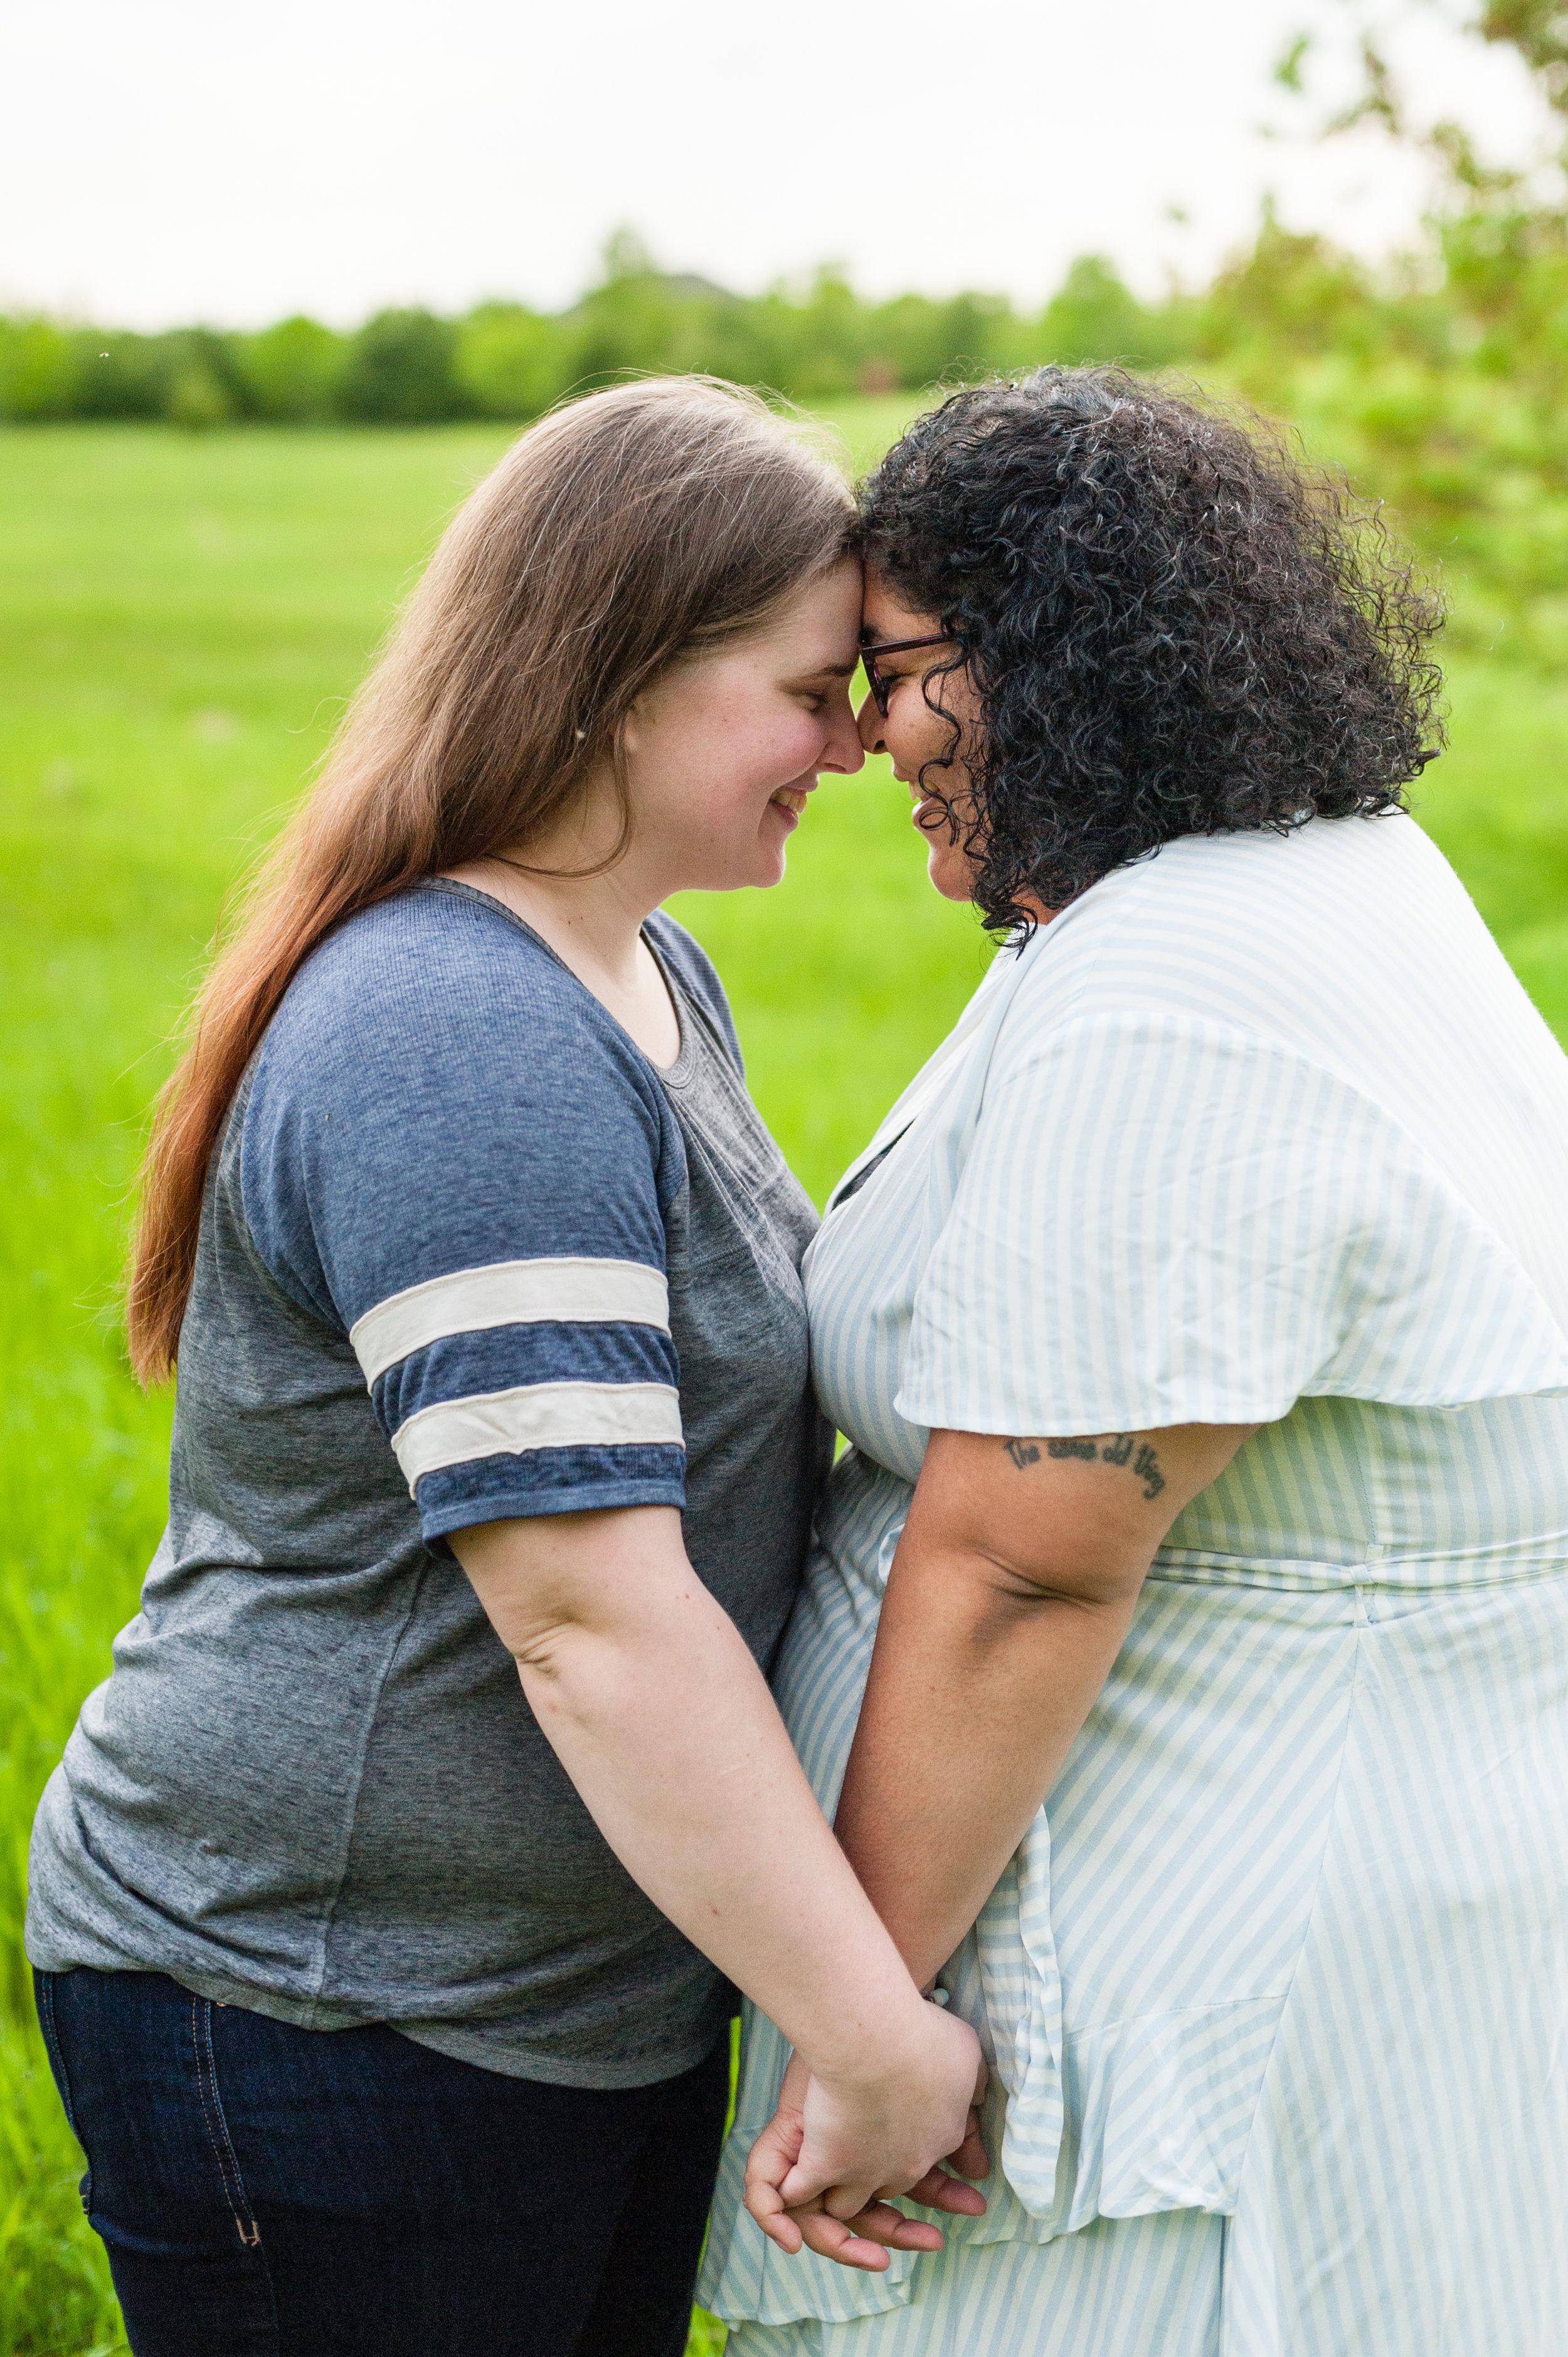 Summer Engagement Photography | Fonferek's Glen, Wisconsin | KLEM Studios Wedding Photographer